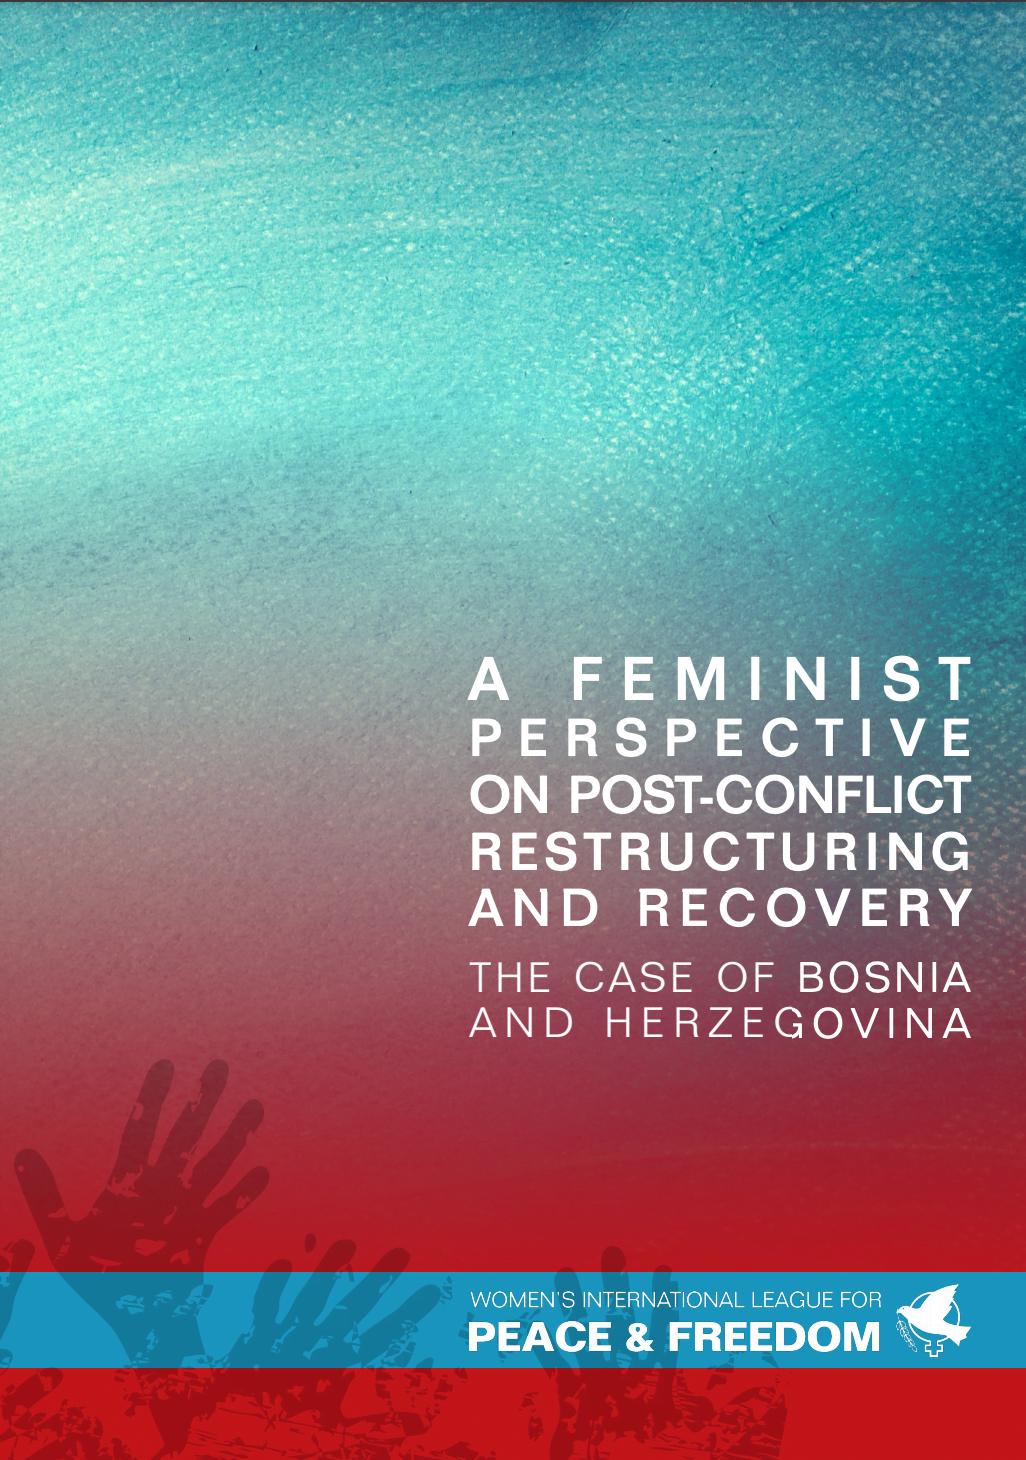 WILPF's publication on Bosnia and Herzegovina